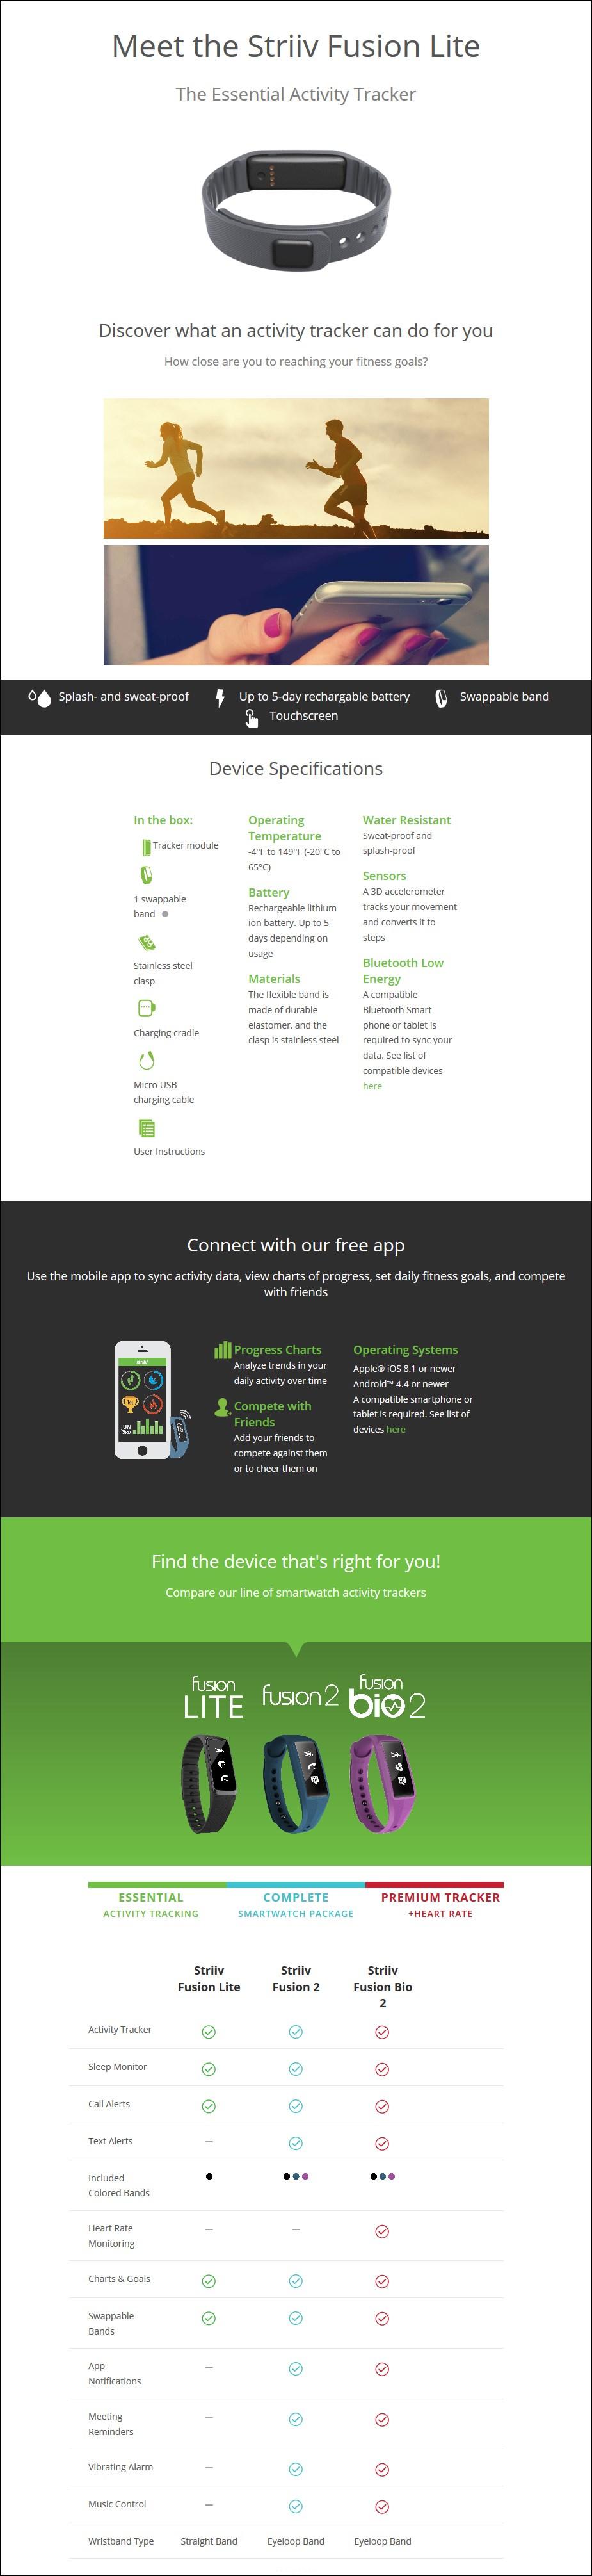 Striiv Fusion Lite Fitness Tracker - Desktop Overview 1